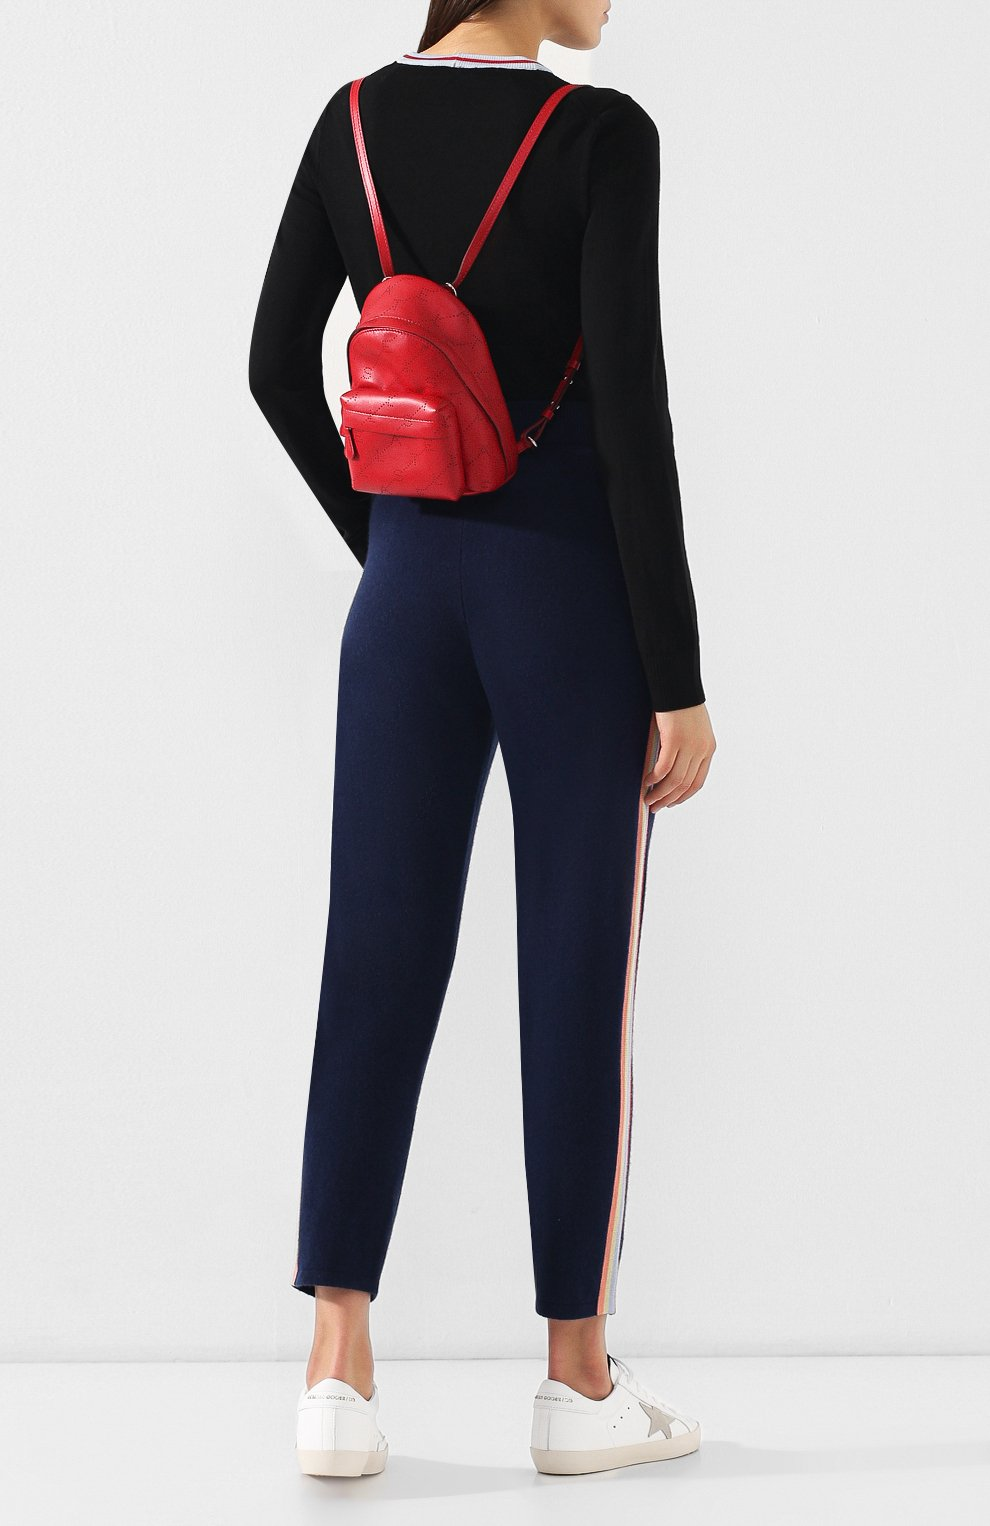 Рюкзак Monogram mini  Stella McCartney красный | Фото №2